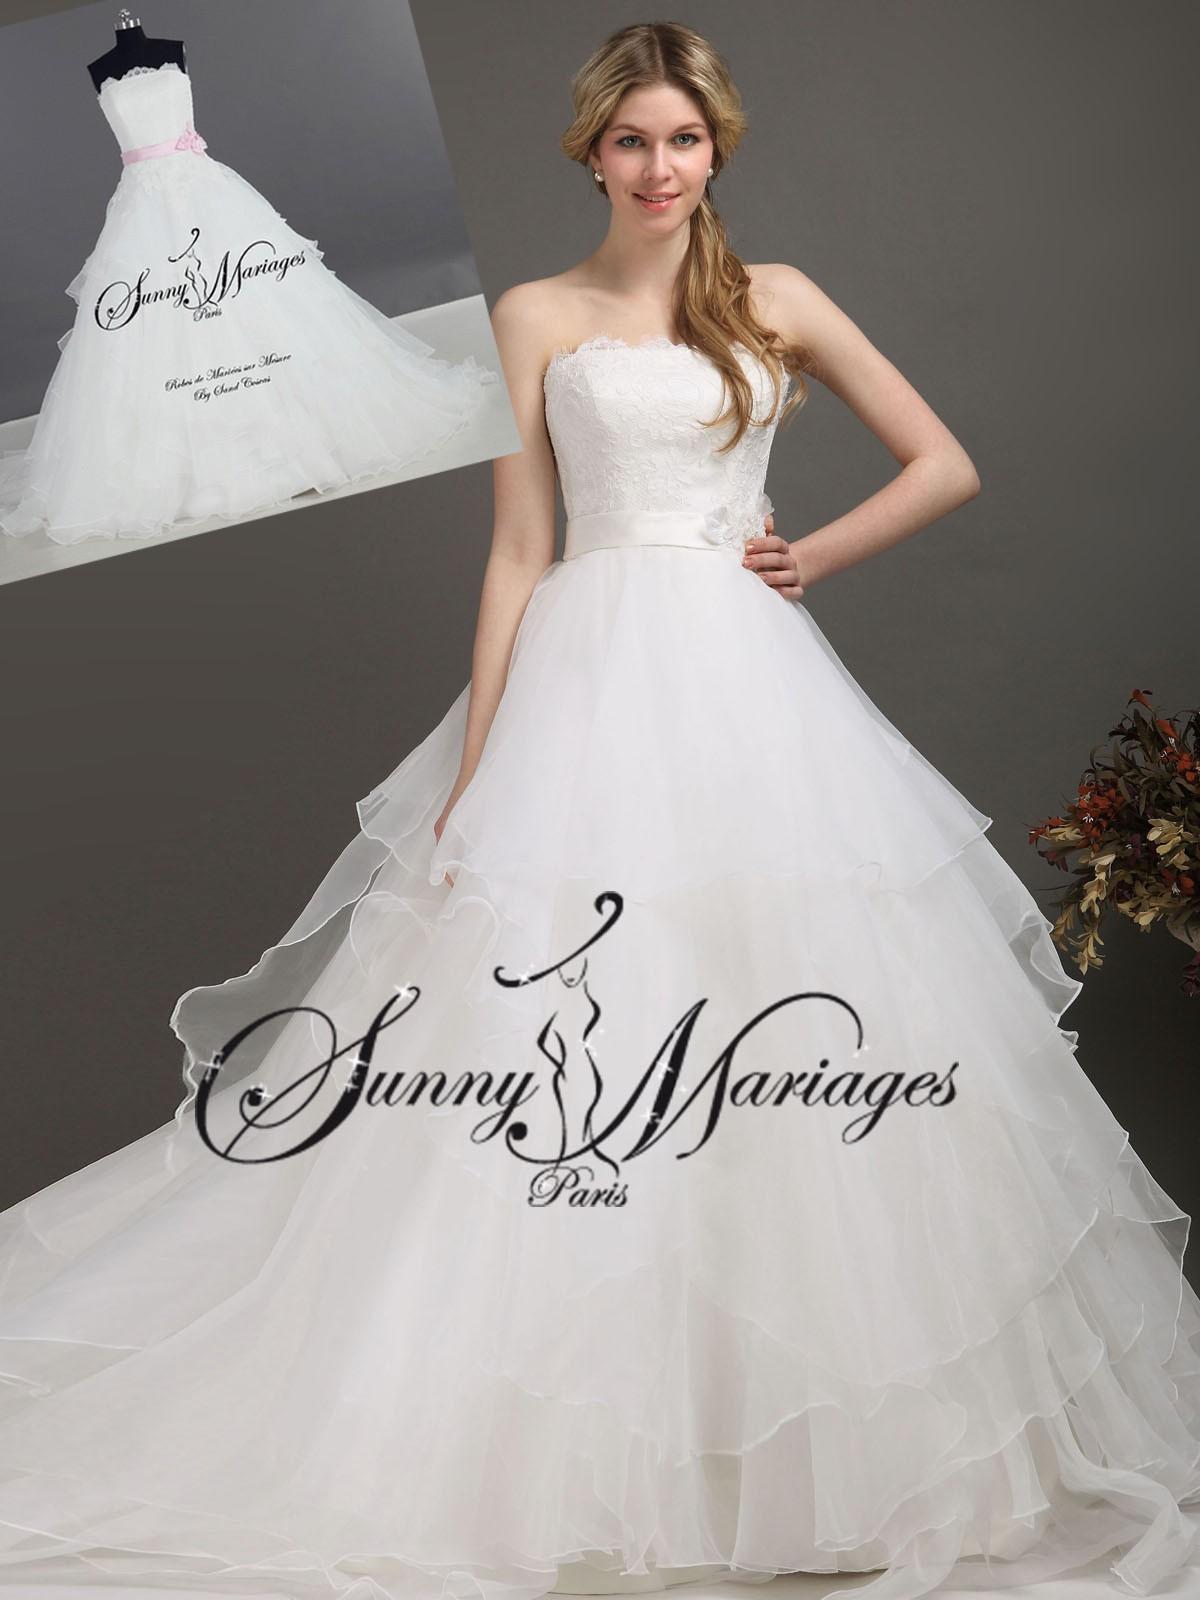 Robe de mariee organza for Chercher une robe pour un mariage